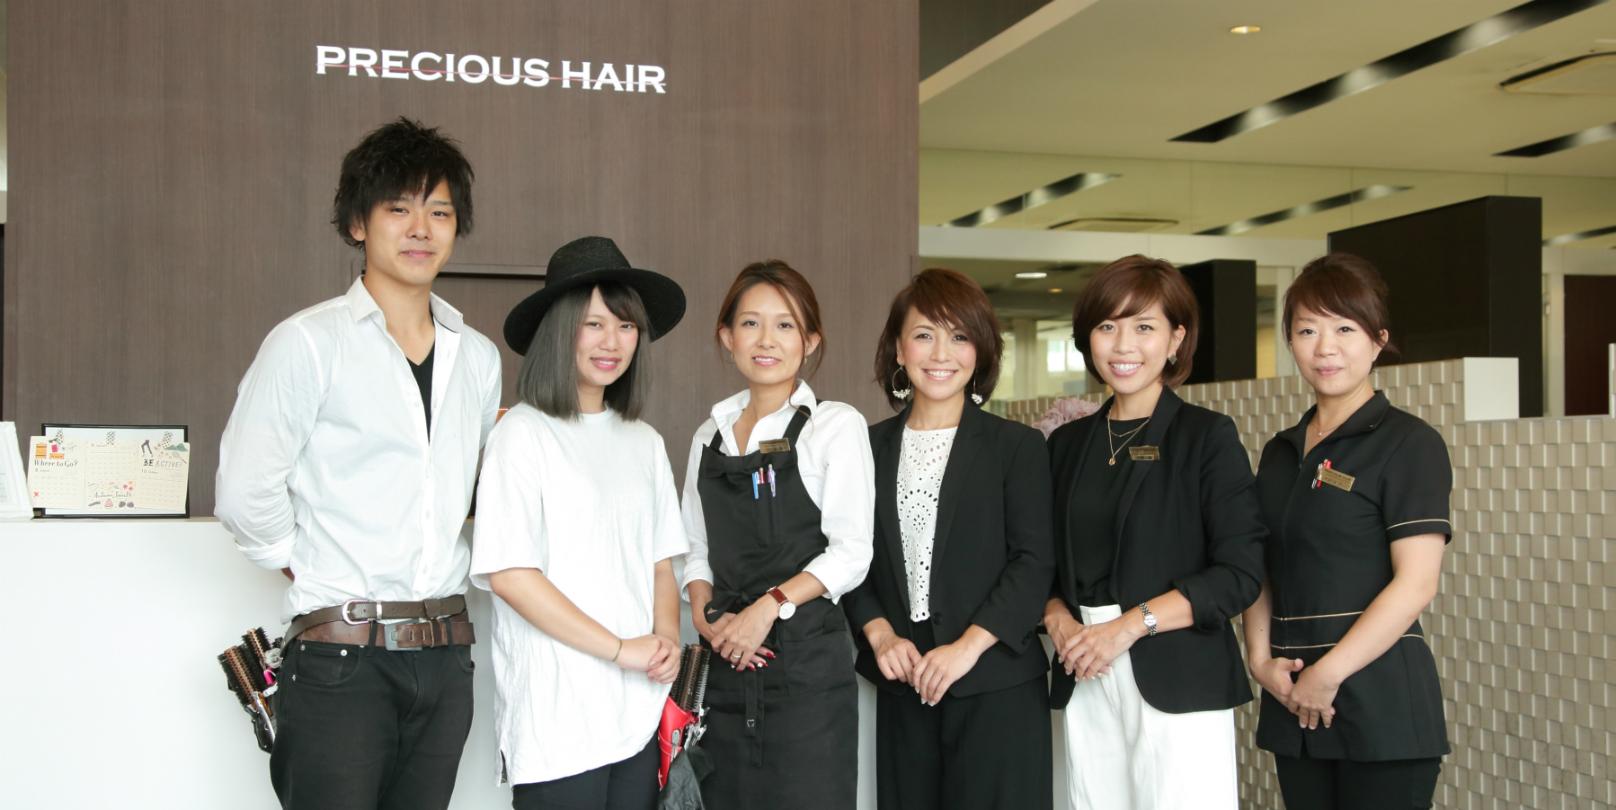 PRECIOUS HAIR 春日井店/スタッフの大半が主婦パート!人手不足を解消する「ワークシェア」とは?